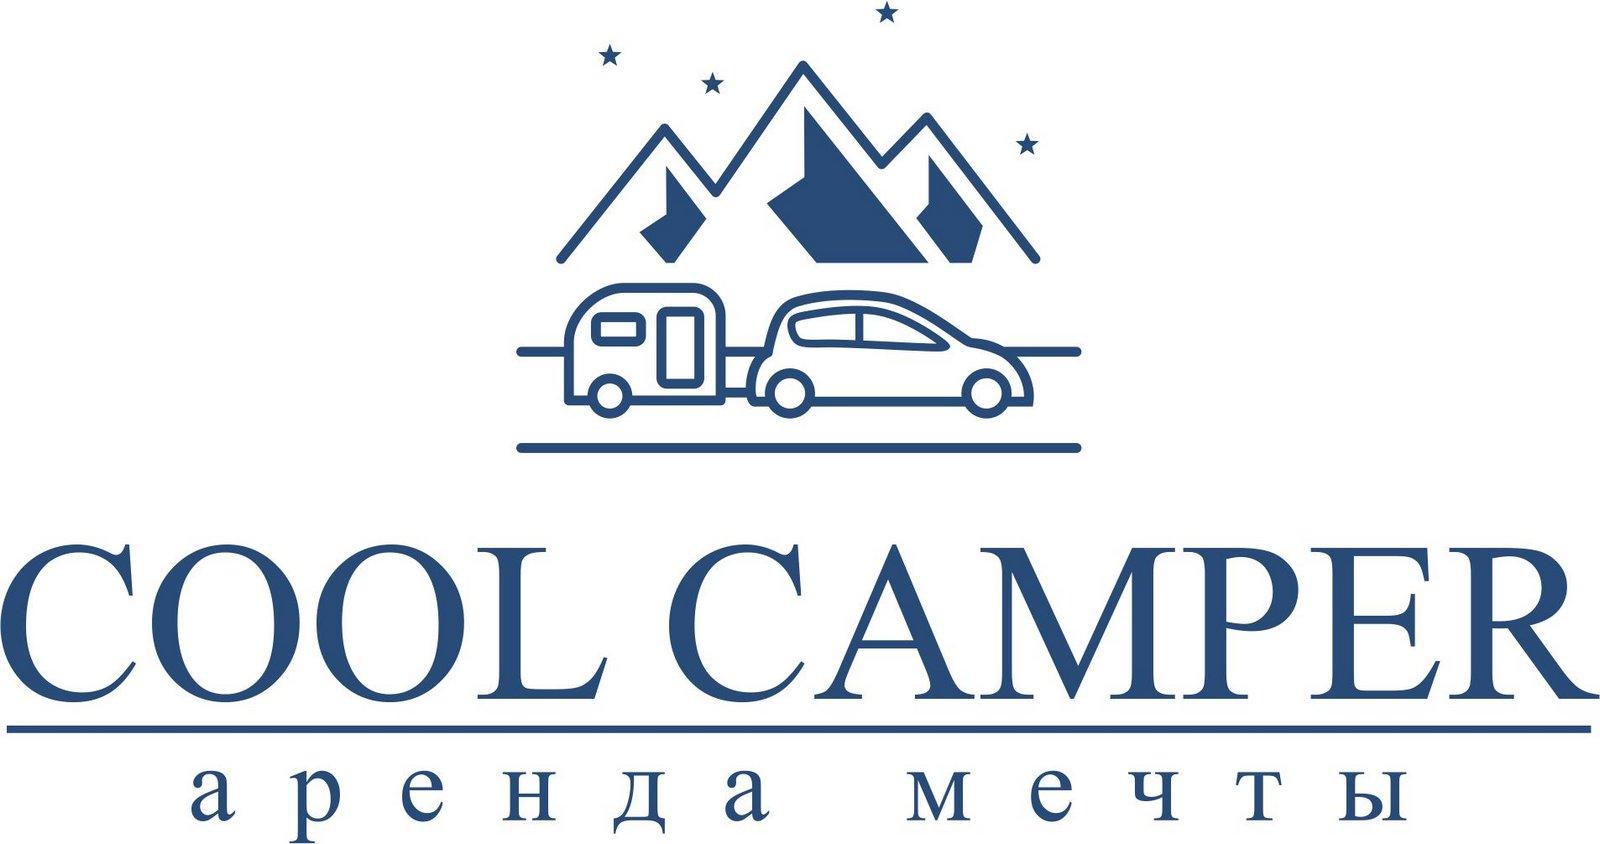 Логотип Coolcamper